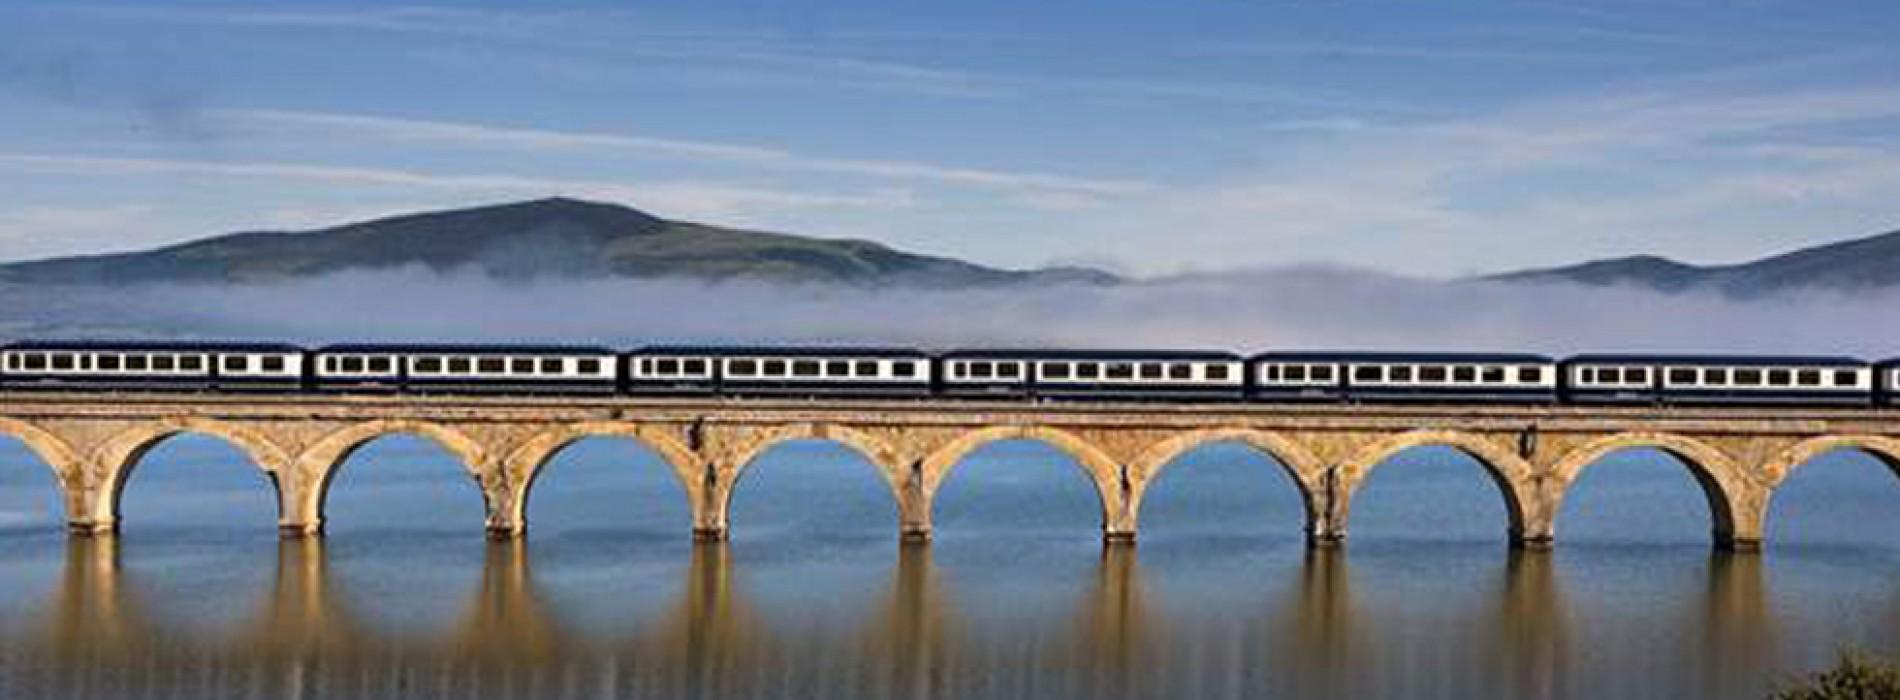 Explore the Greenest Spain aboard El Transcantábrico Luxury Tourist Trains